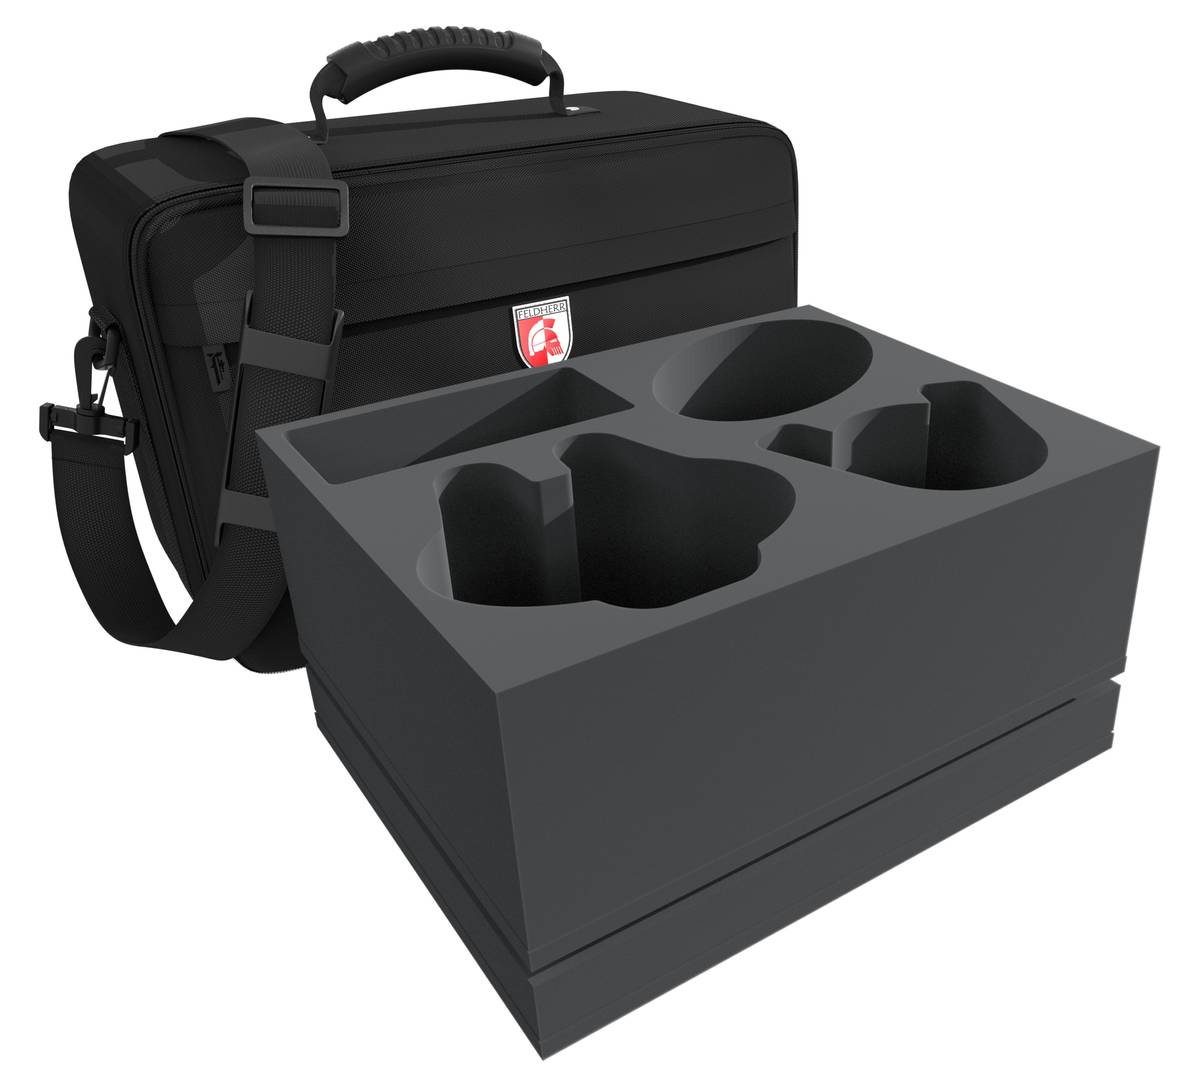 Feldherr MAXI bag for Adeptus Mechanicus